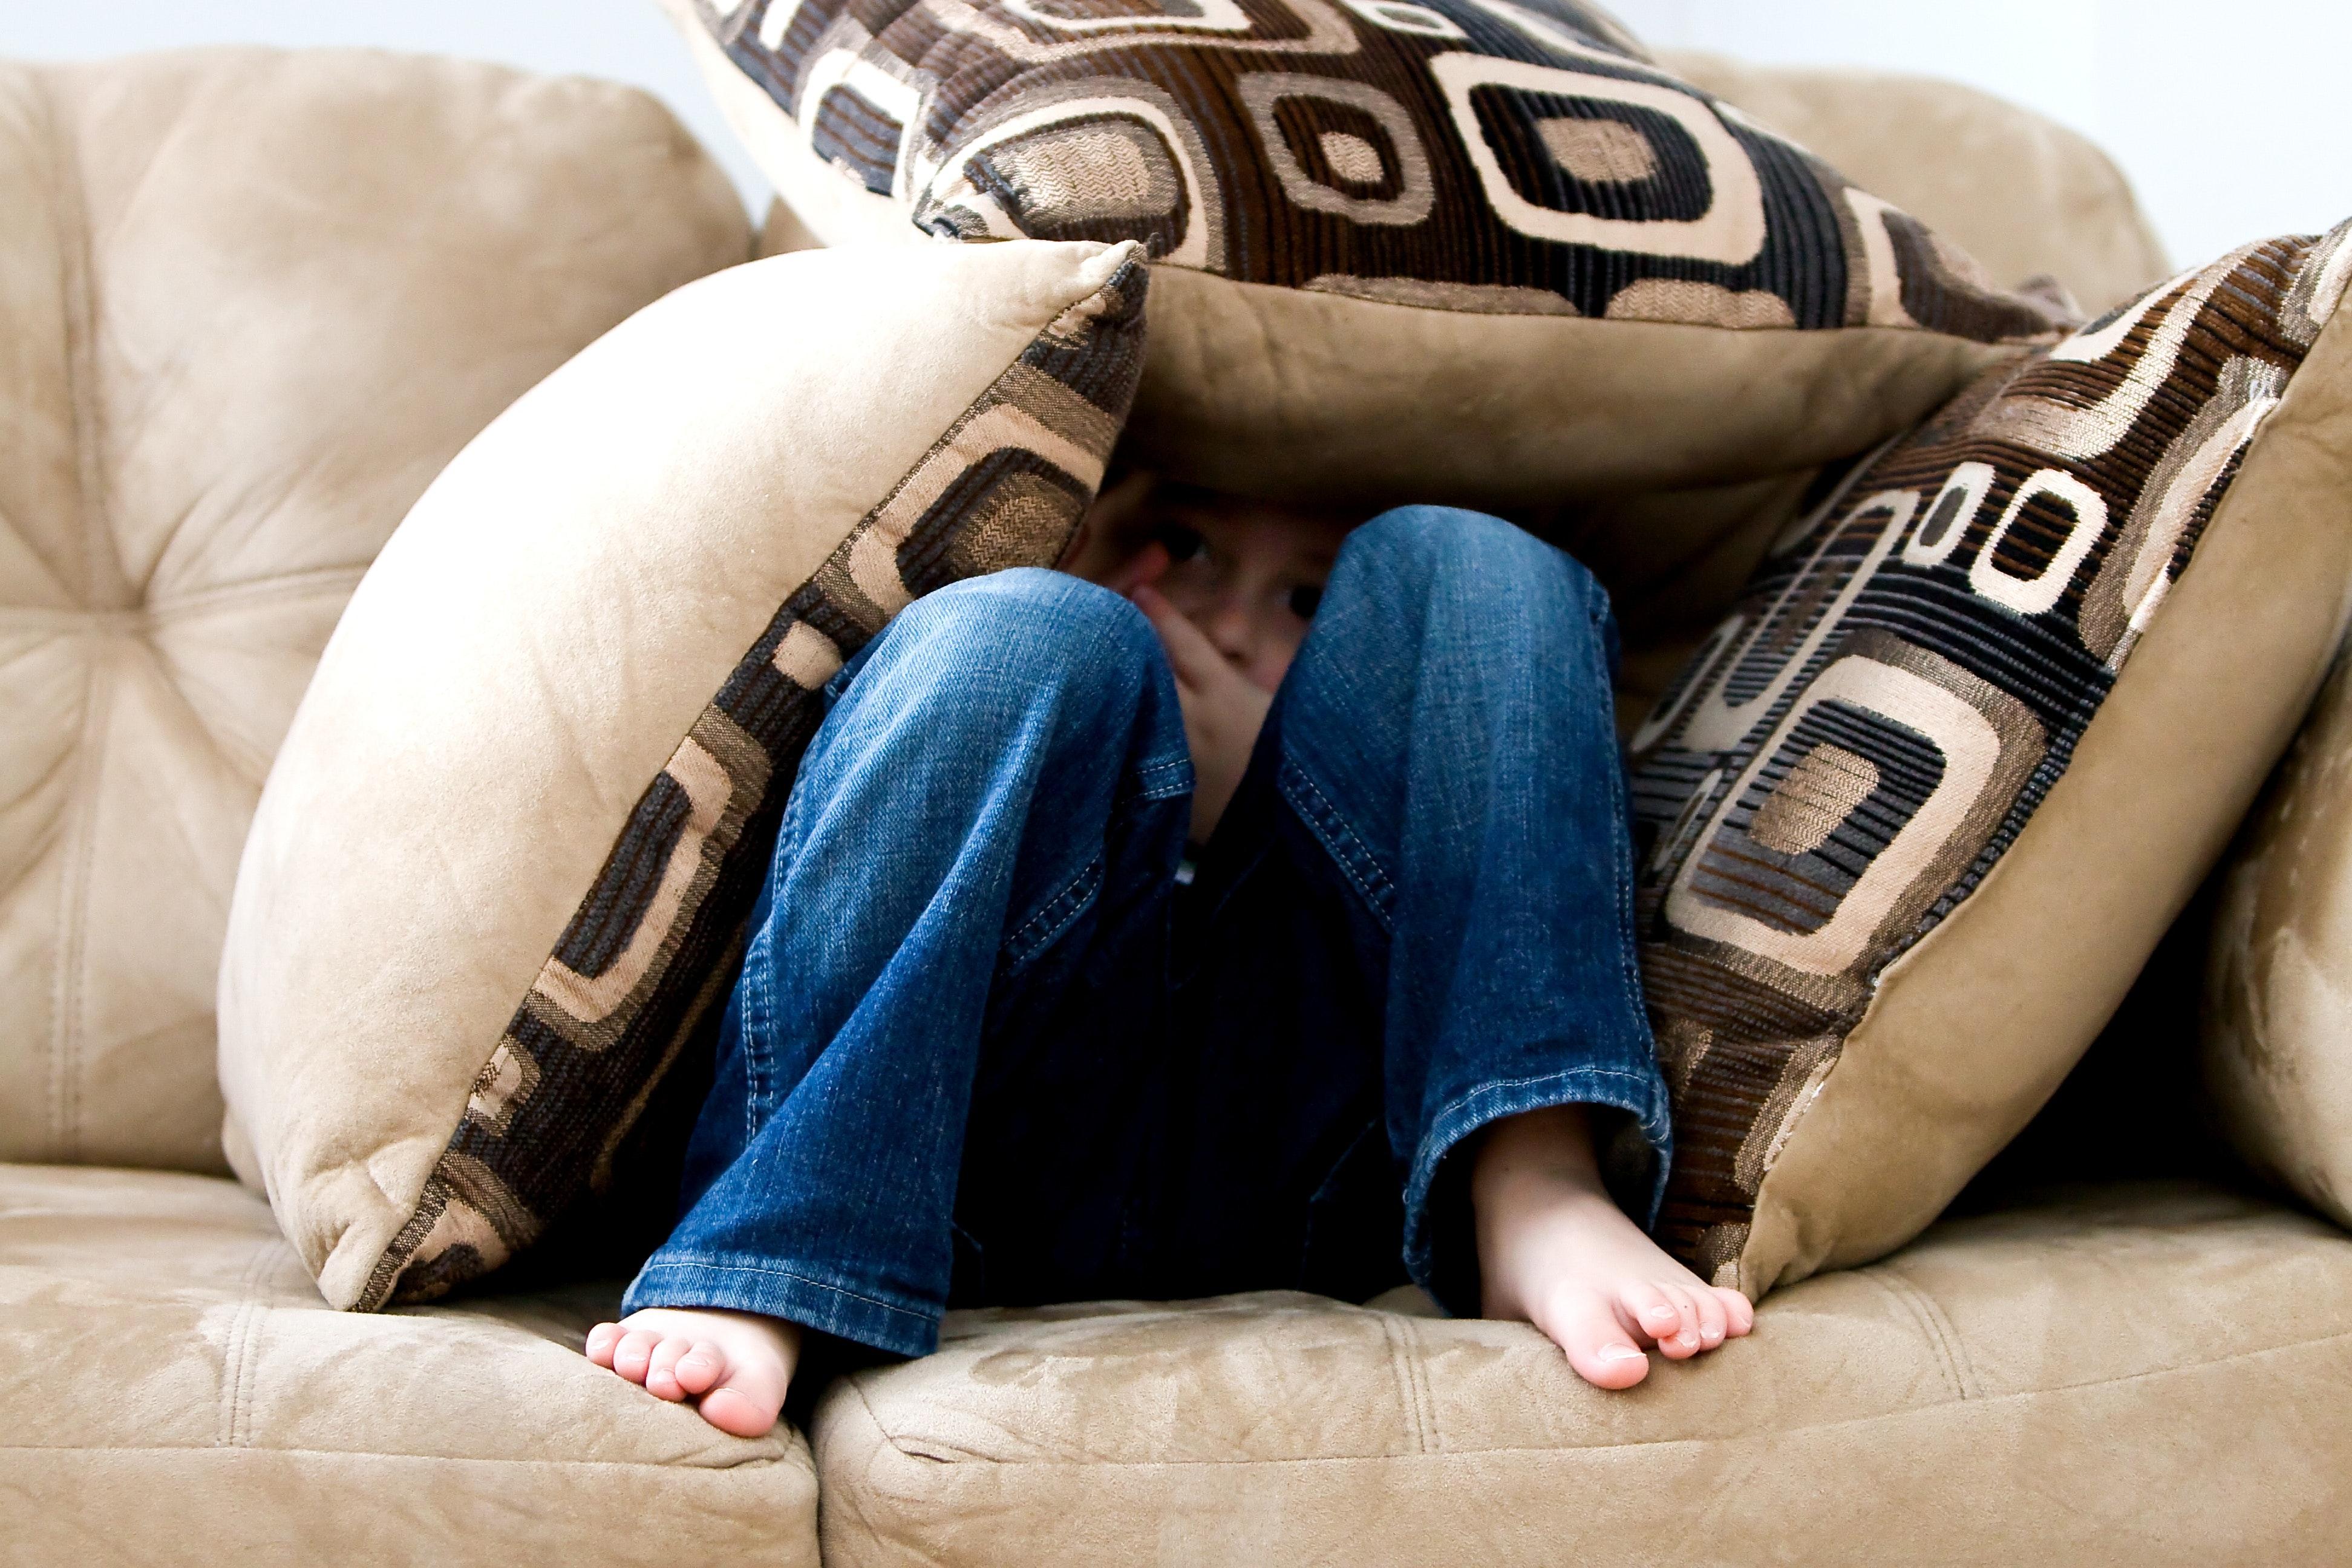 Medo de sair de casa pelo coronavírus? Confira algumas dicas para superá-lo!